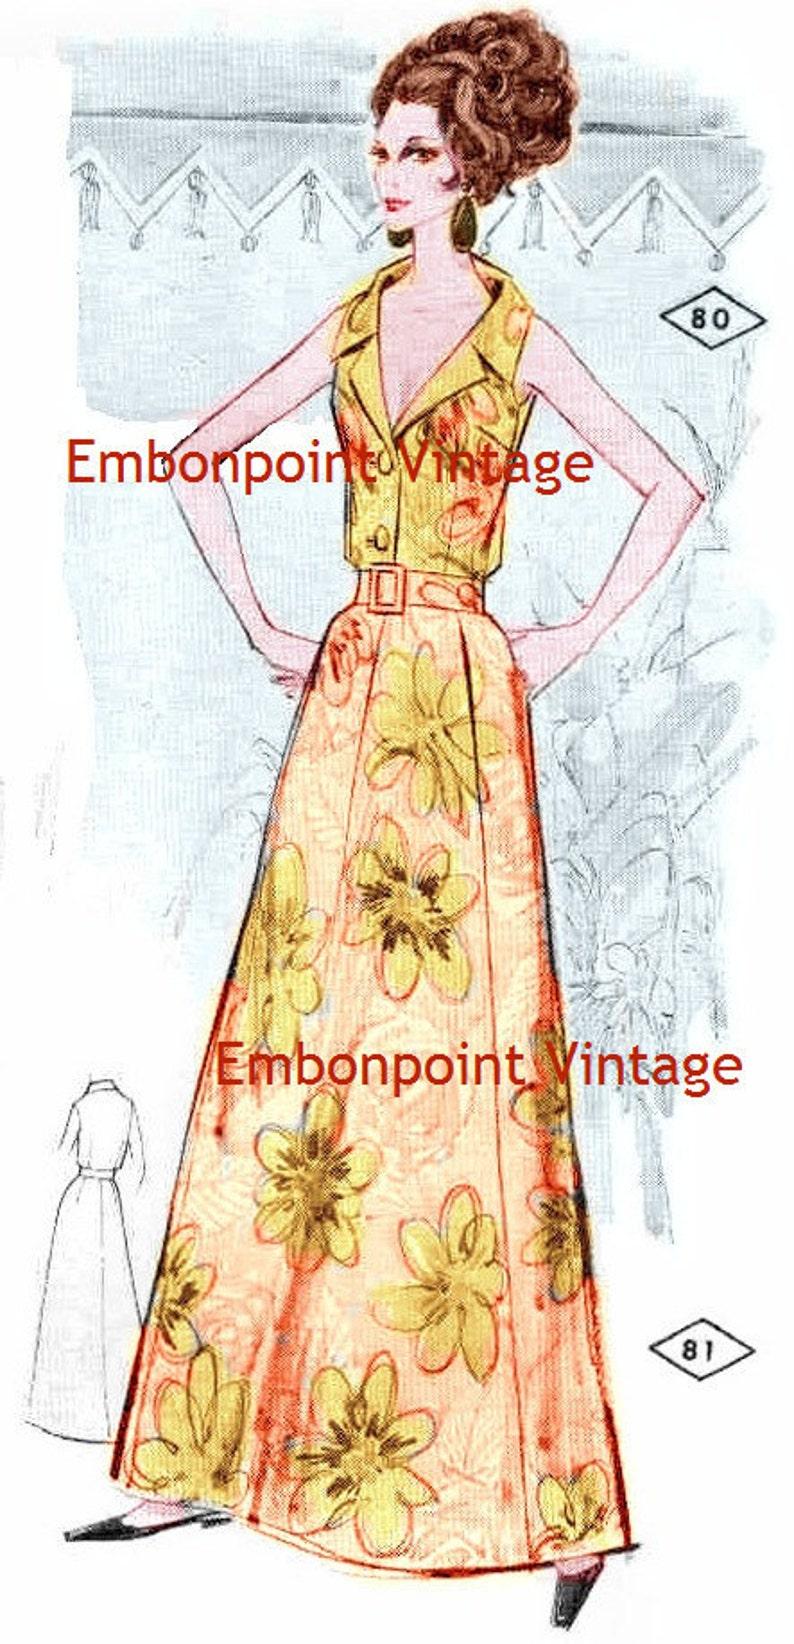 1960s – 70s Sewing Patterns- Dresses, Tops, Pants, Men's Plus Size (or any size) Vintage 1969 Skirt Pattern - PDF - Pattern No 81 Roxanne Skirt $5.41 AT vintagedancer.com